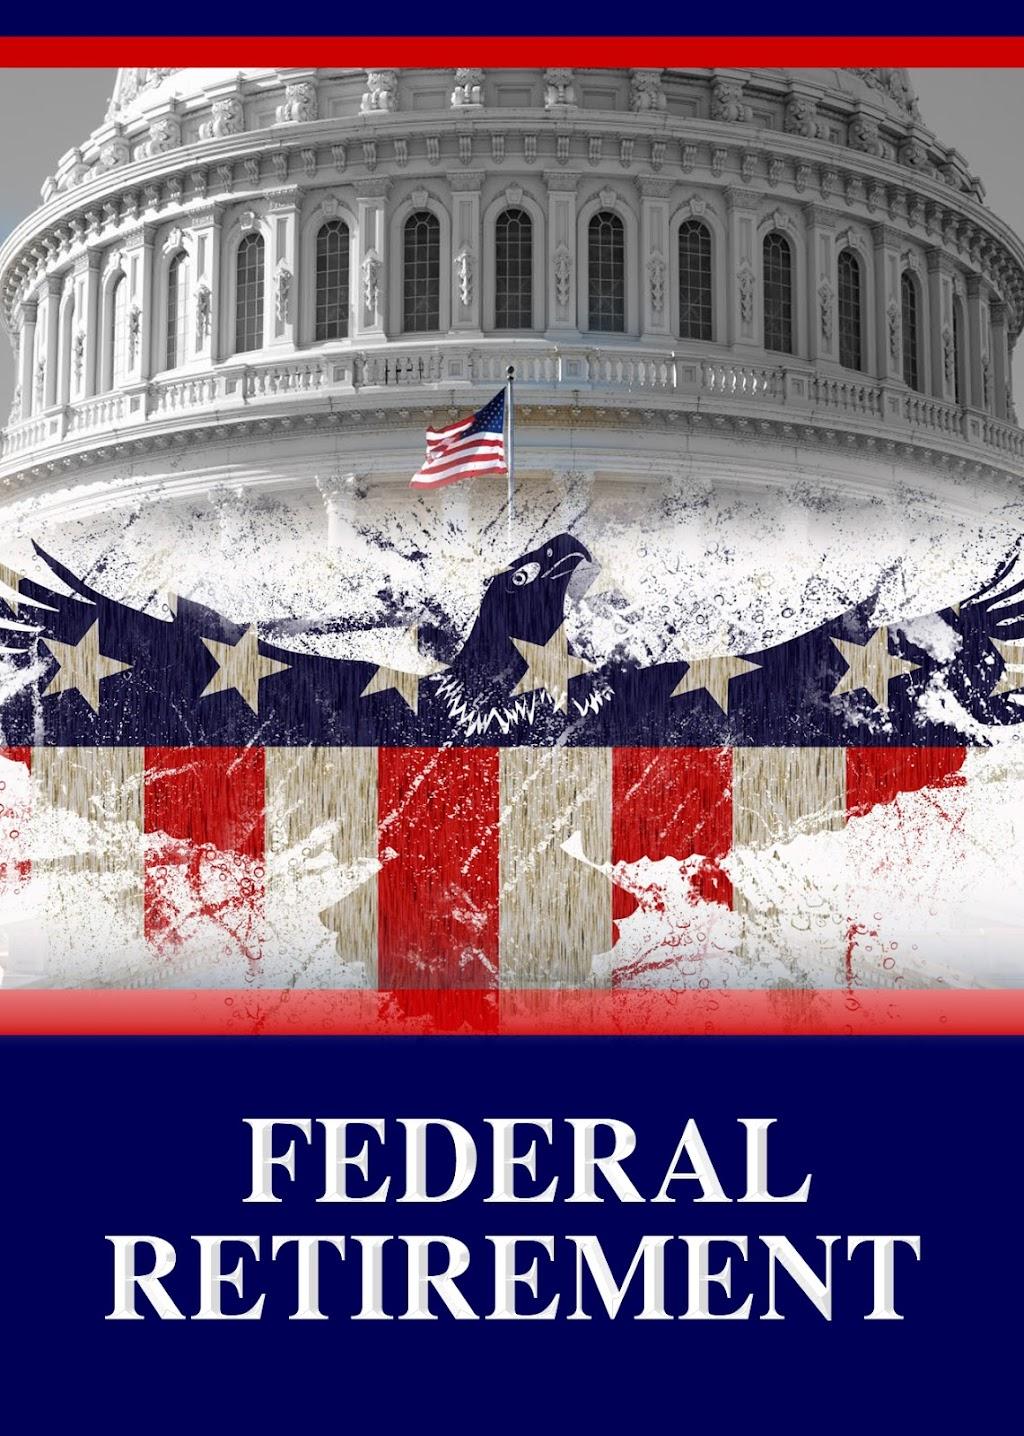 Federal retirement